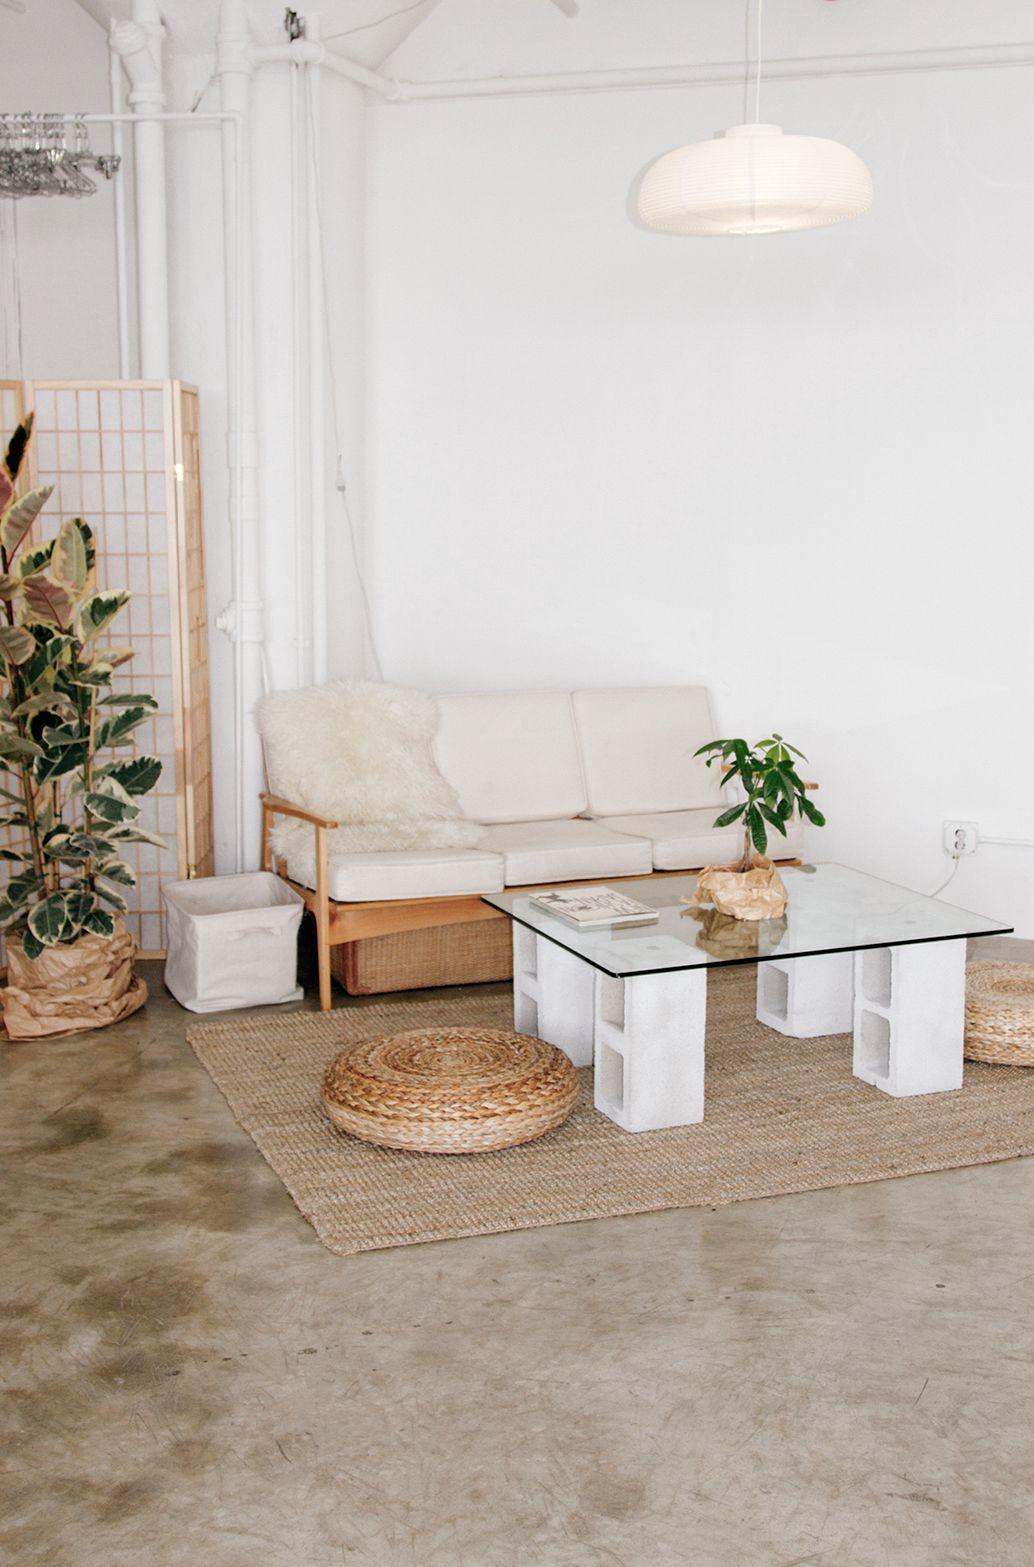 Shaina mote studio home pinterest concrete table diy concrete